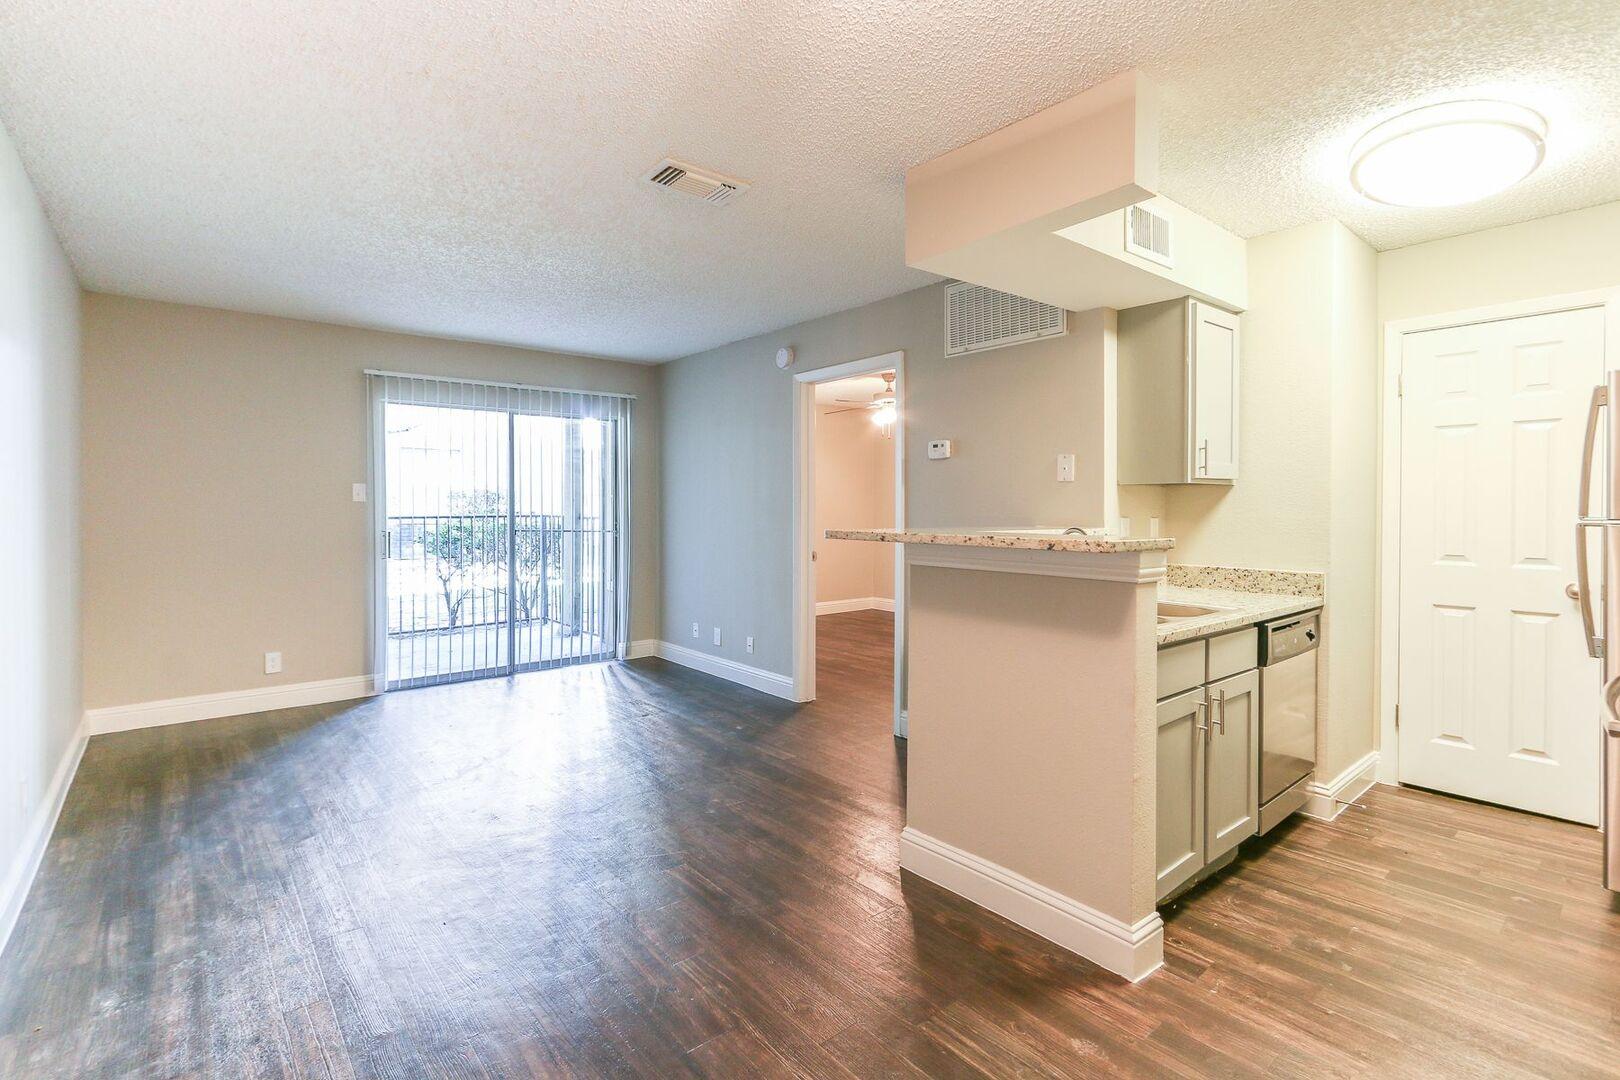 apartments for rent in san antonio tx renata home